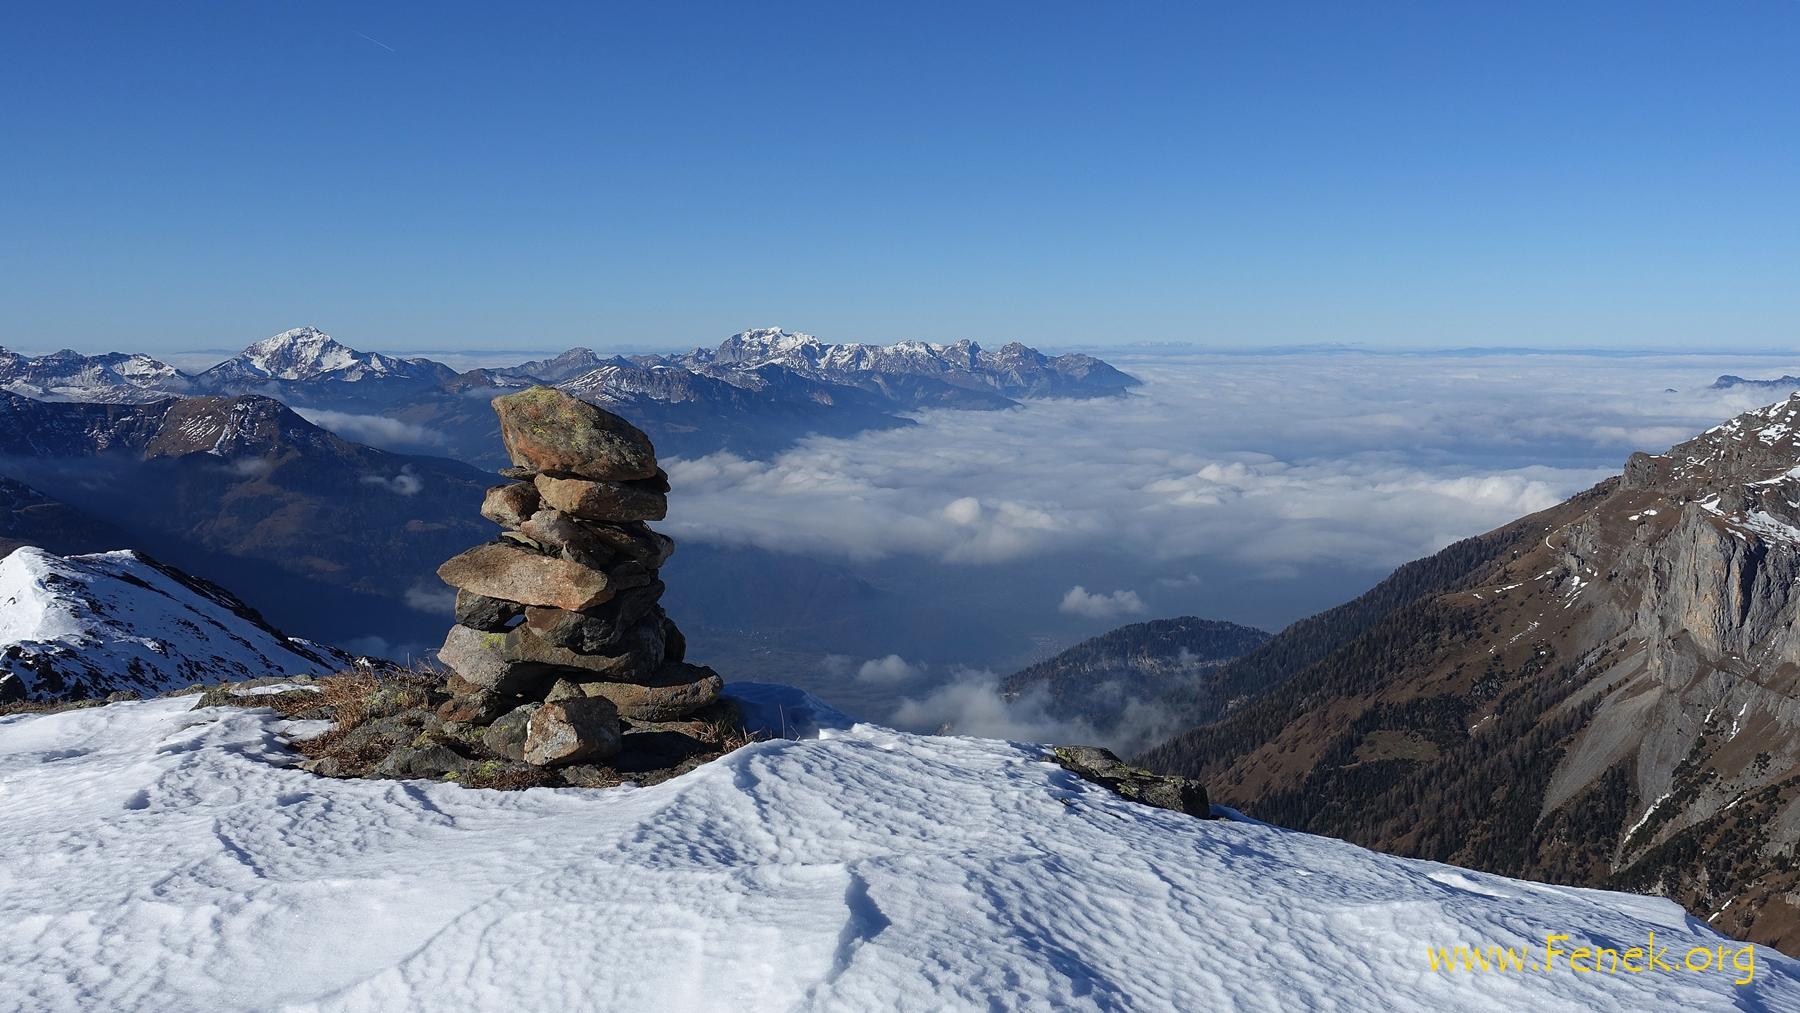 Nebelmeer über Rhonetal und Genfersee